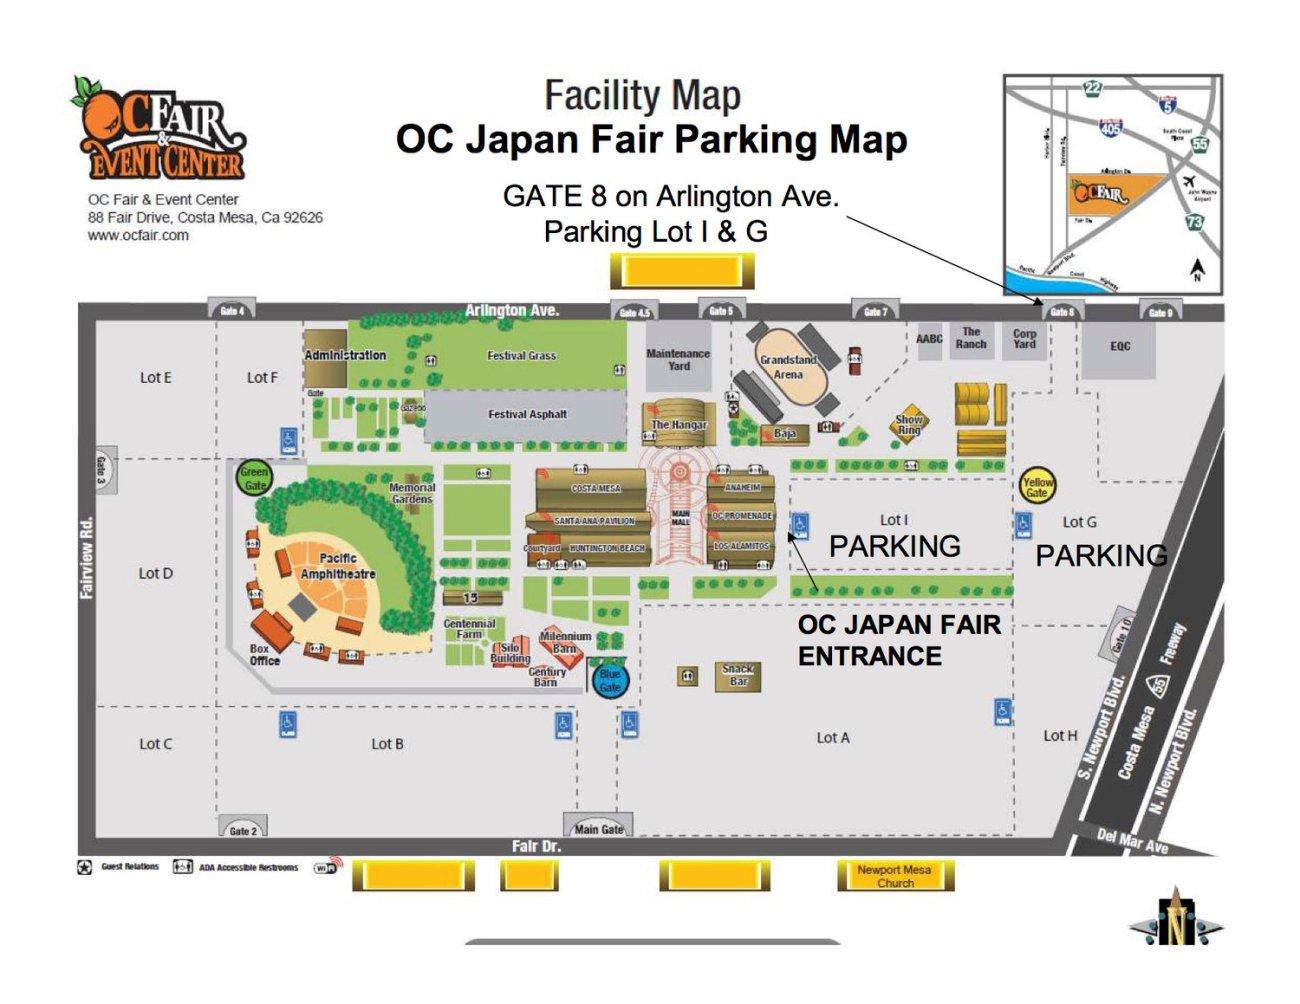 OC Japan Fair Parking Map